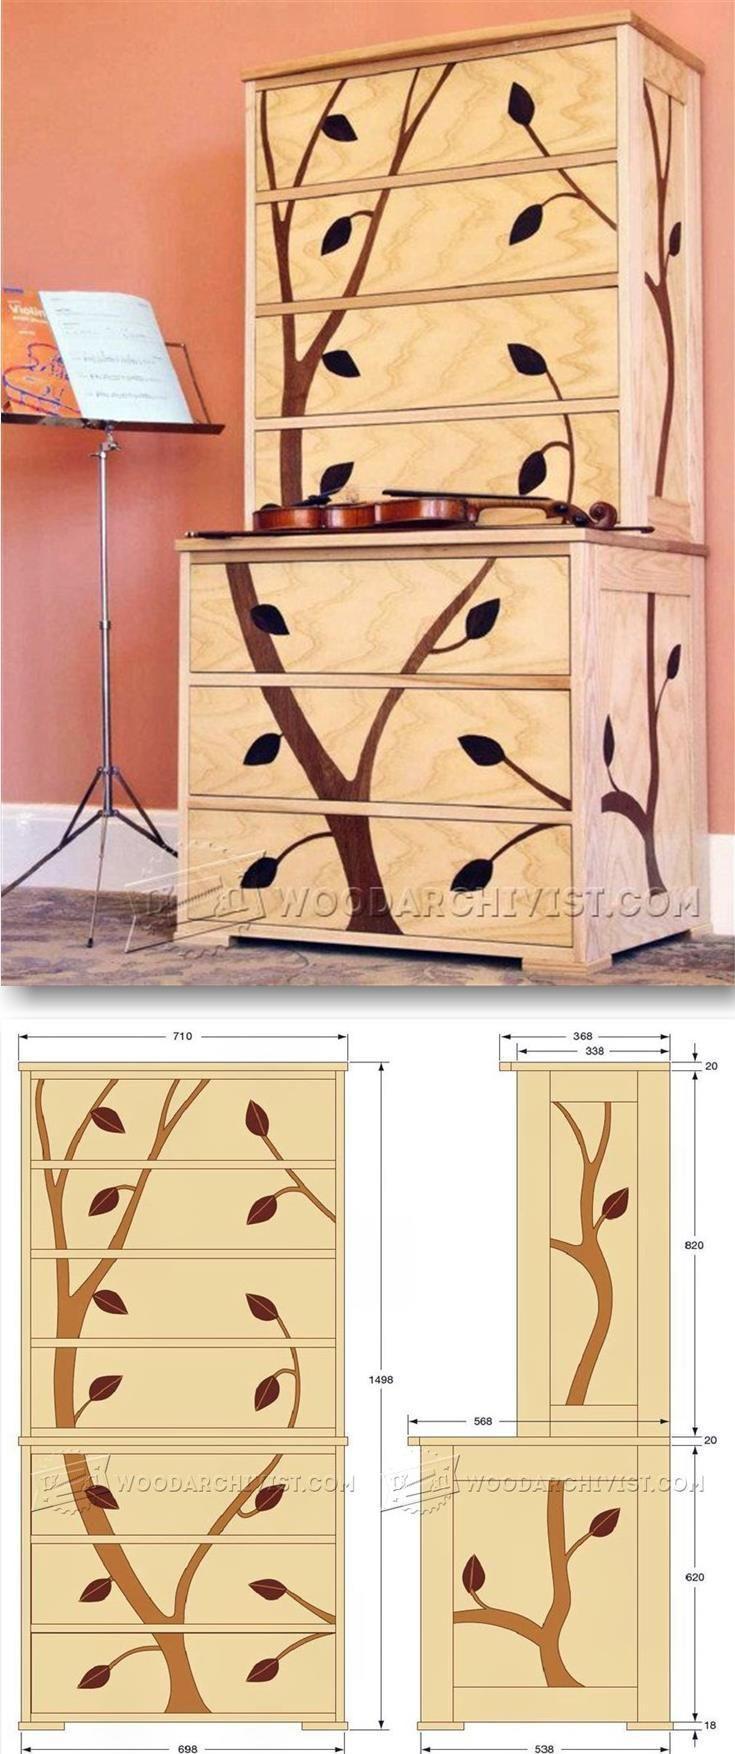 Marquetry Cabinet Plans - Furniture Plans and Projects | WoodArchivist.com | WoodArchivist.com